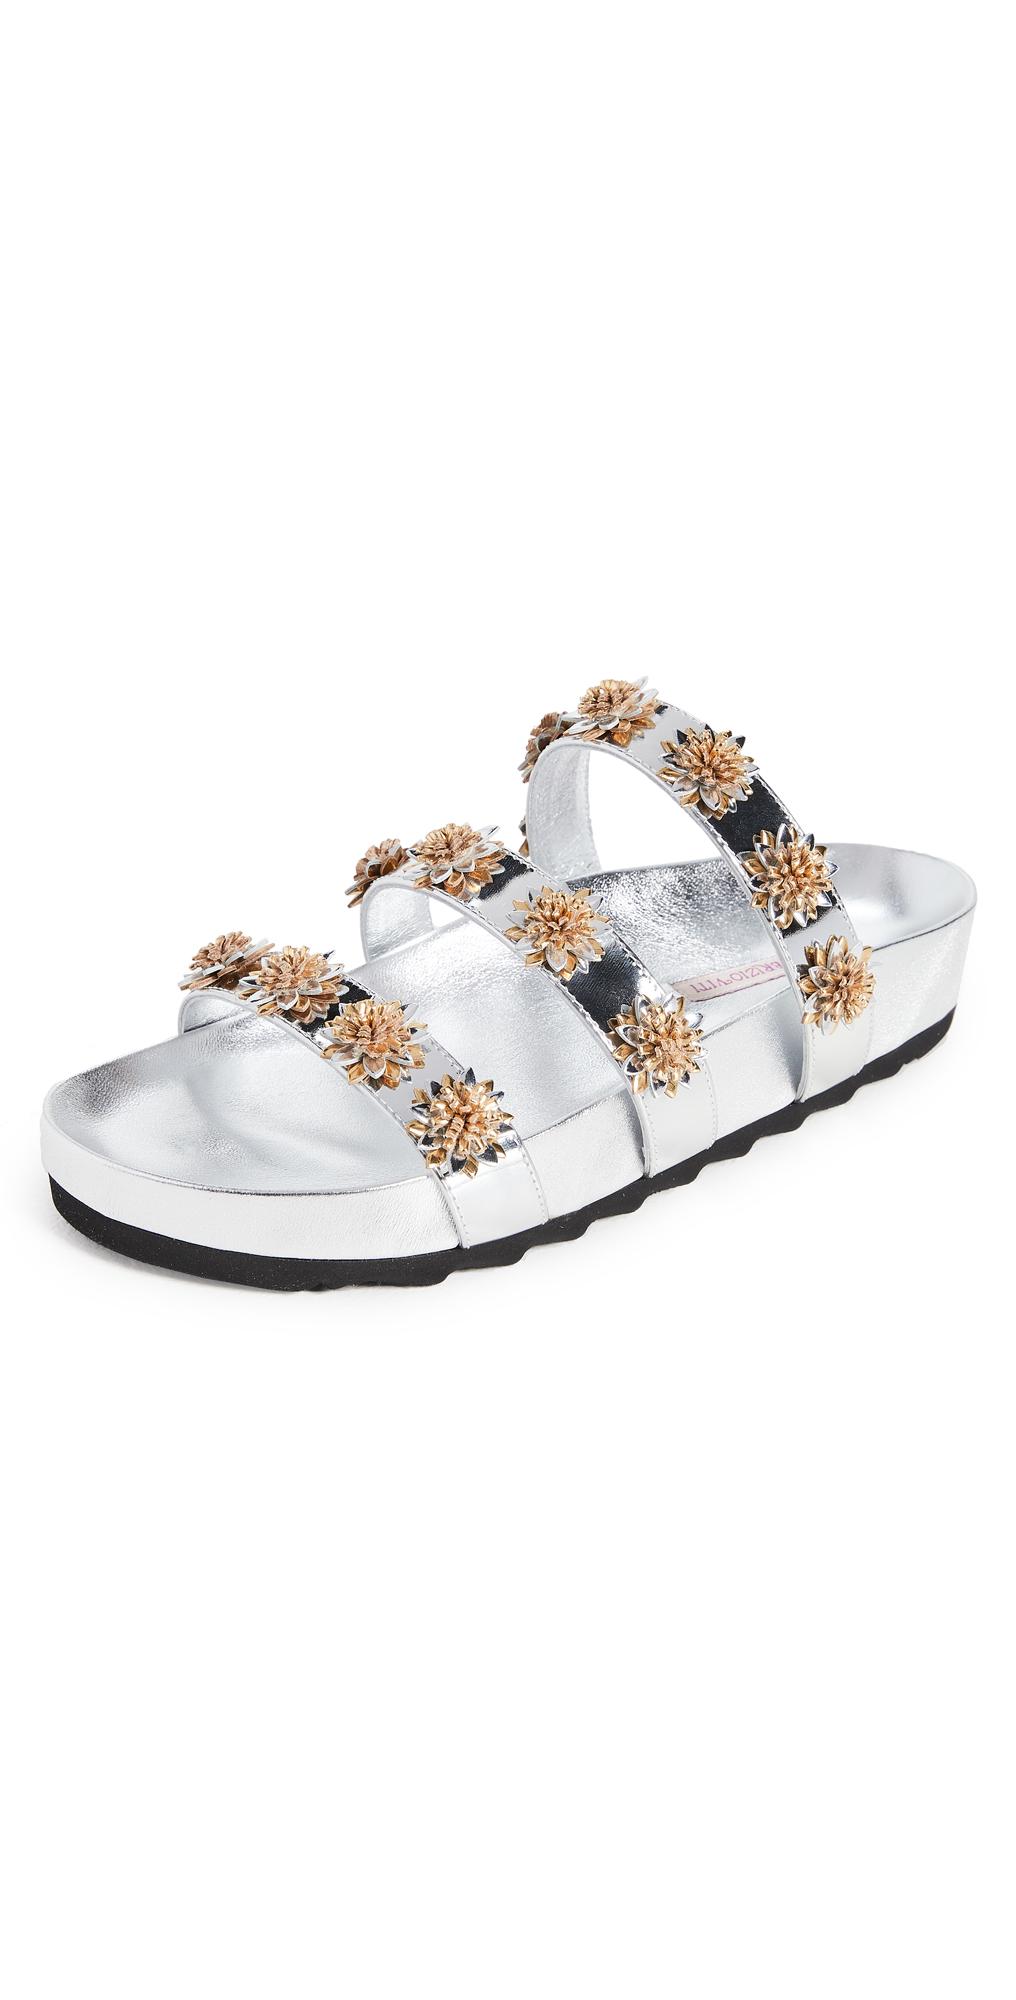 Daisy Berkley Slides